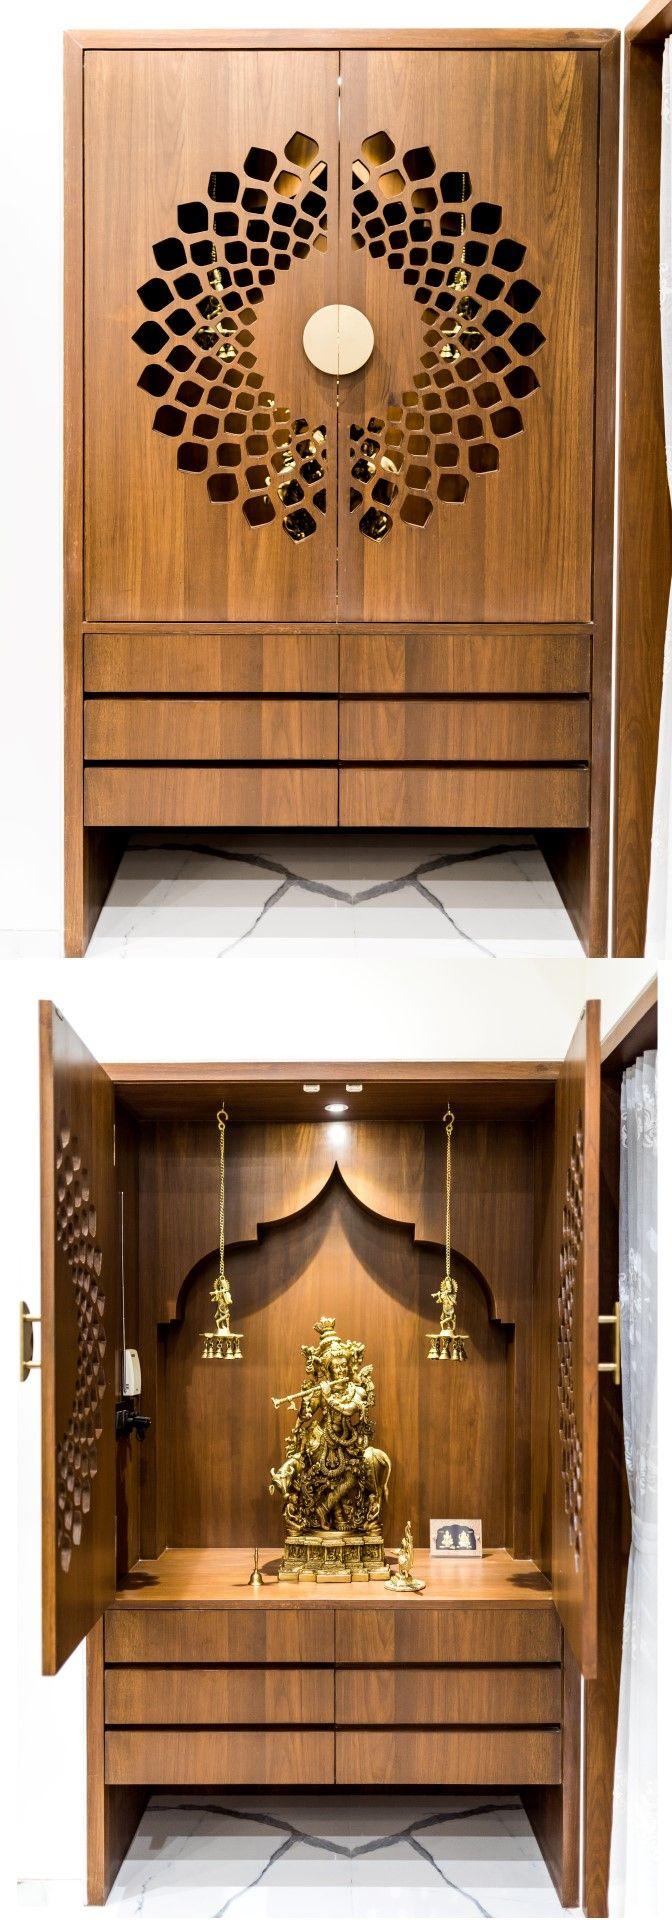 141 Best Pooja Room Images On Pinterest Pooja Rooms Prayer Room And Bedroom Doors